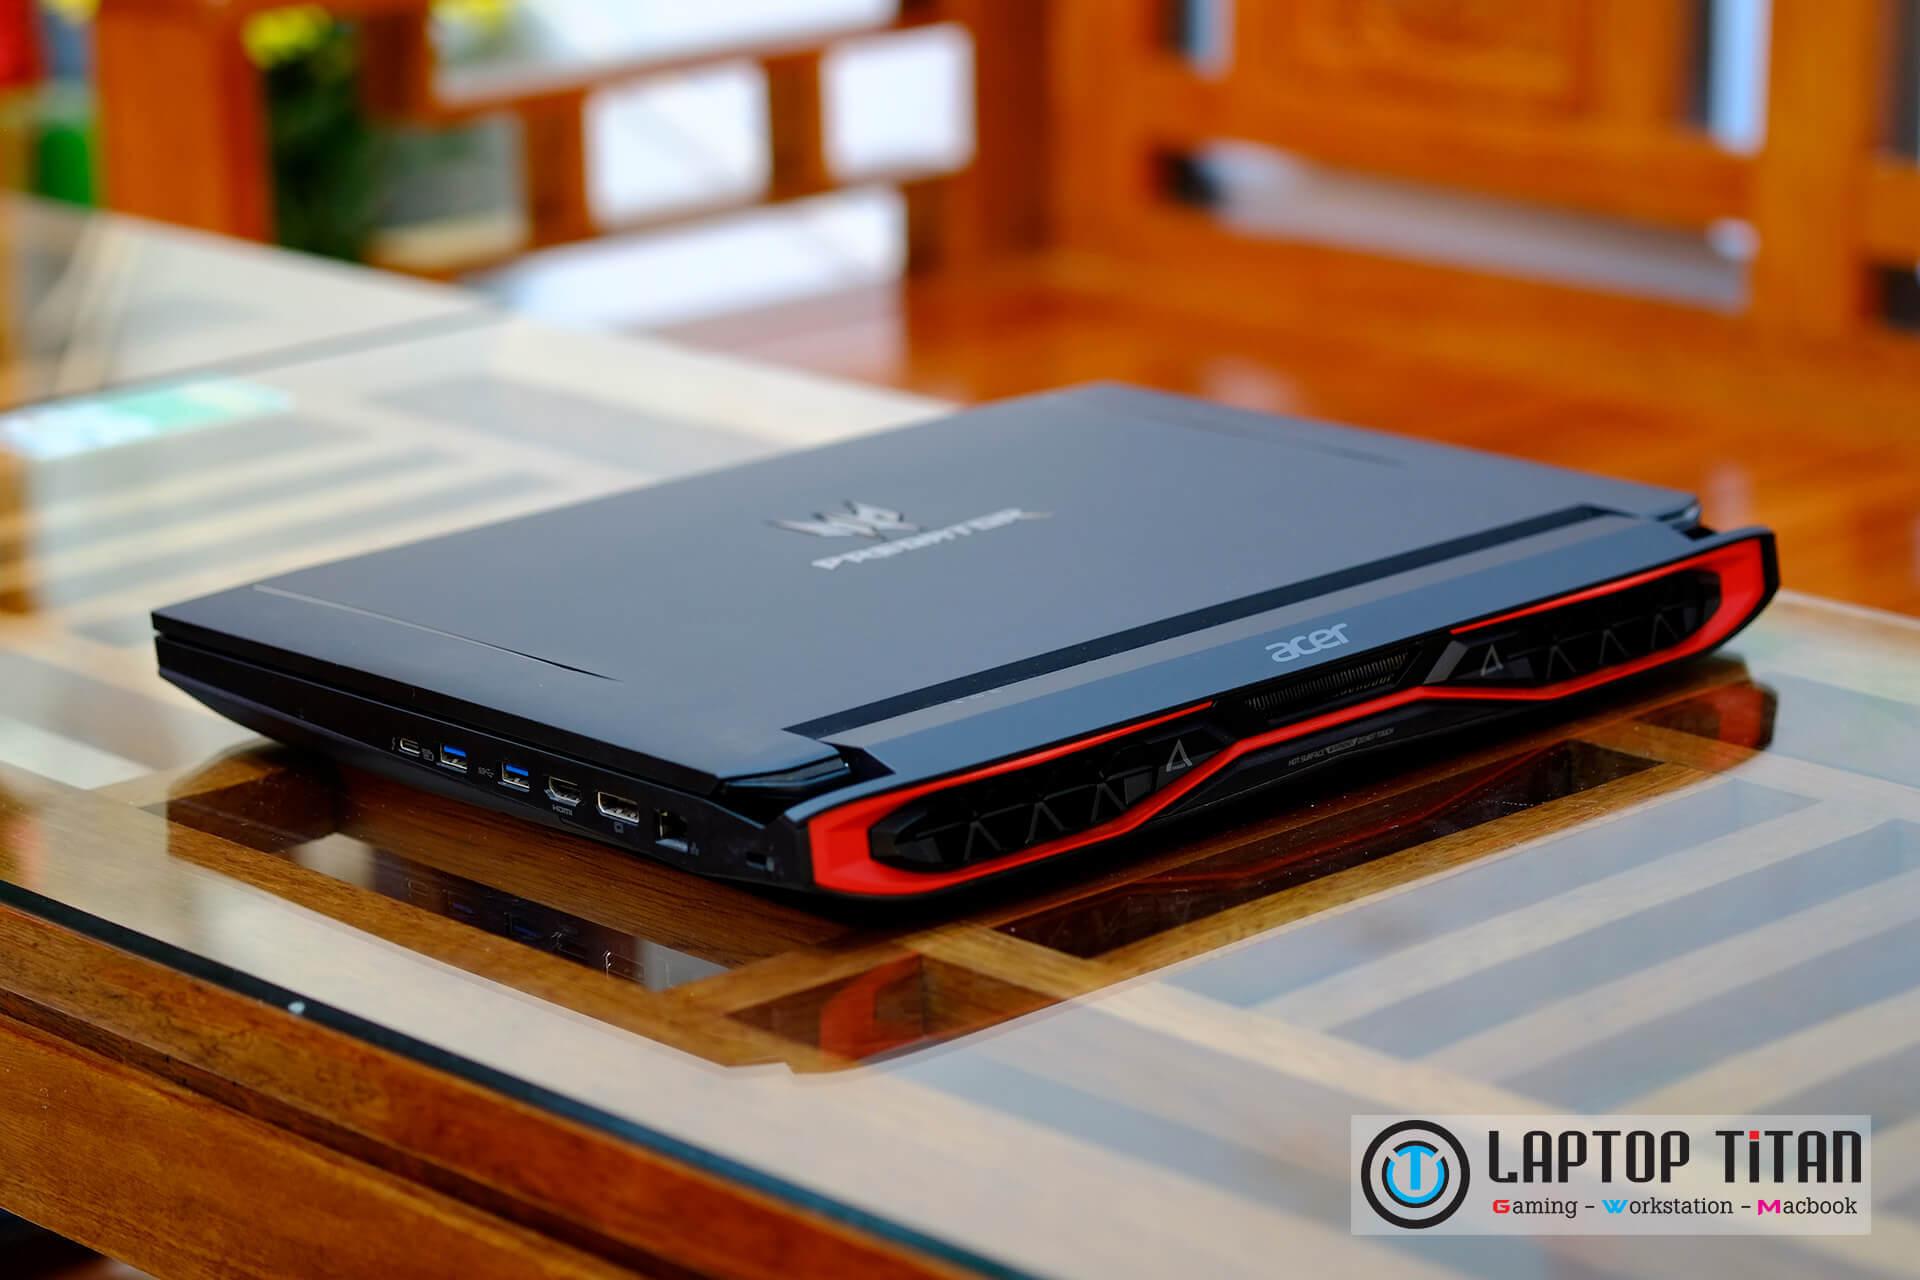 "Acer Predator 15 G9-593 i7 7700HQ / 16GB / 128GB + 2TB / GTX 1060 6GB / 15.6"" FHD"